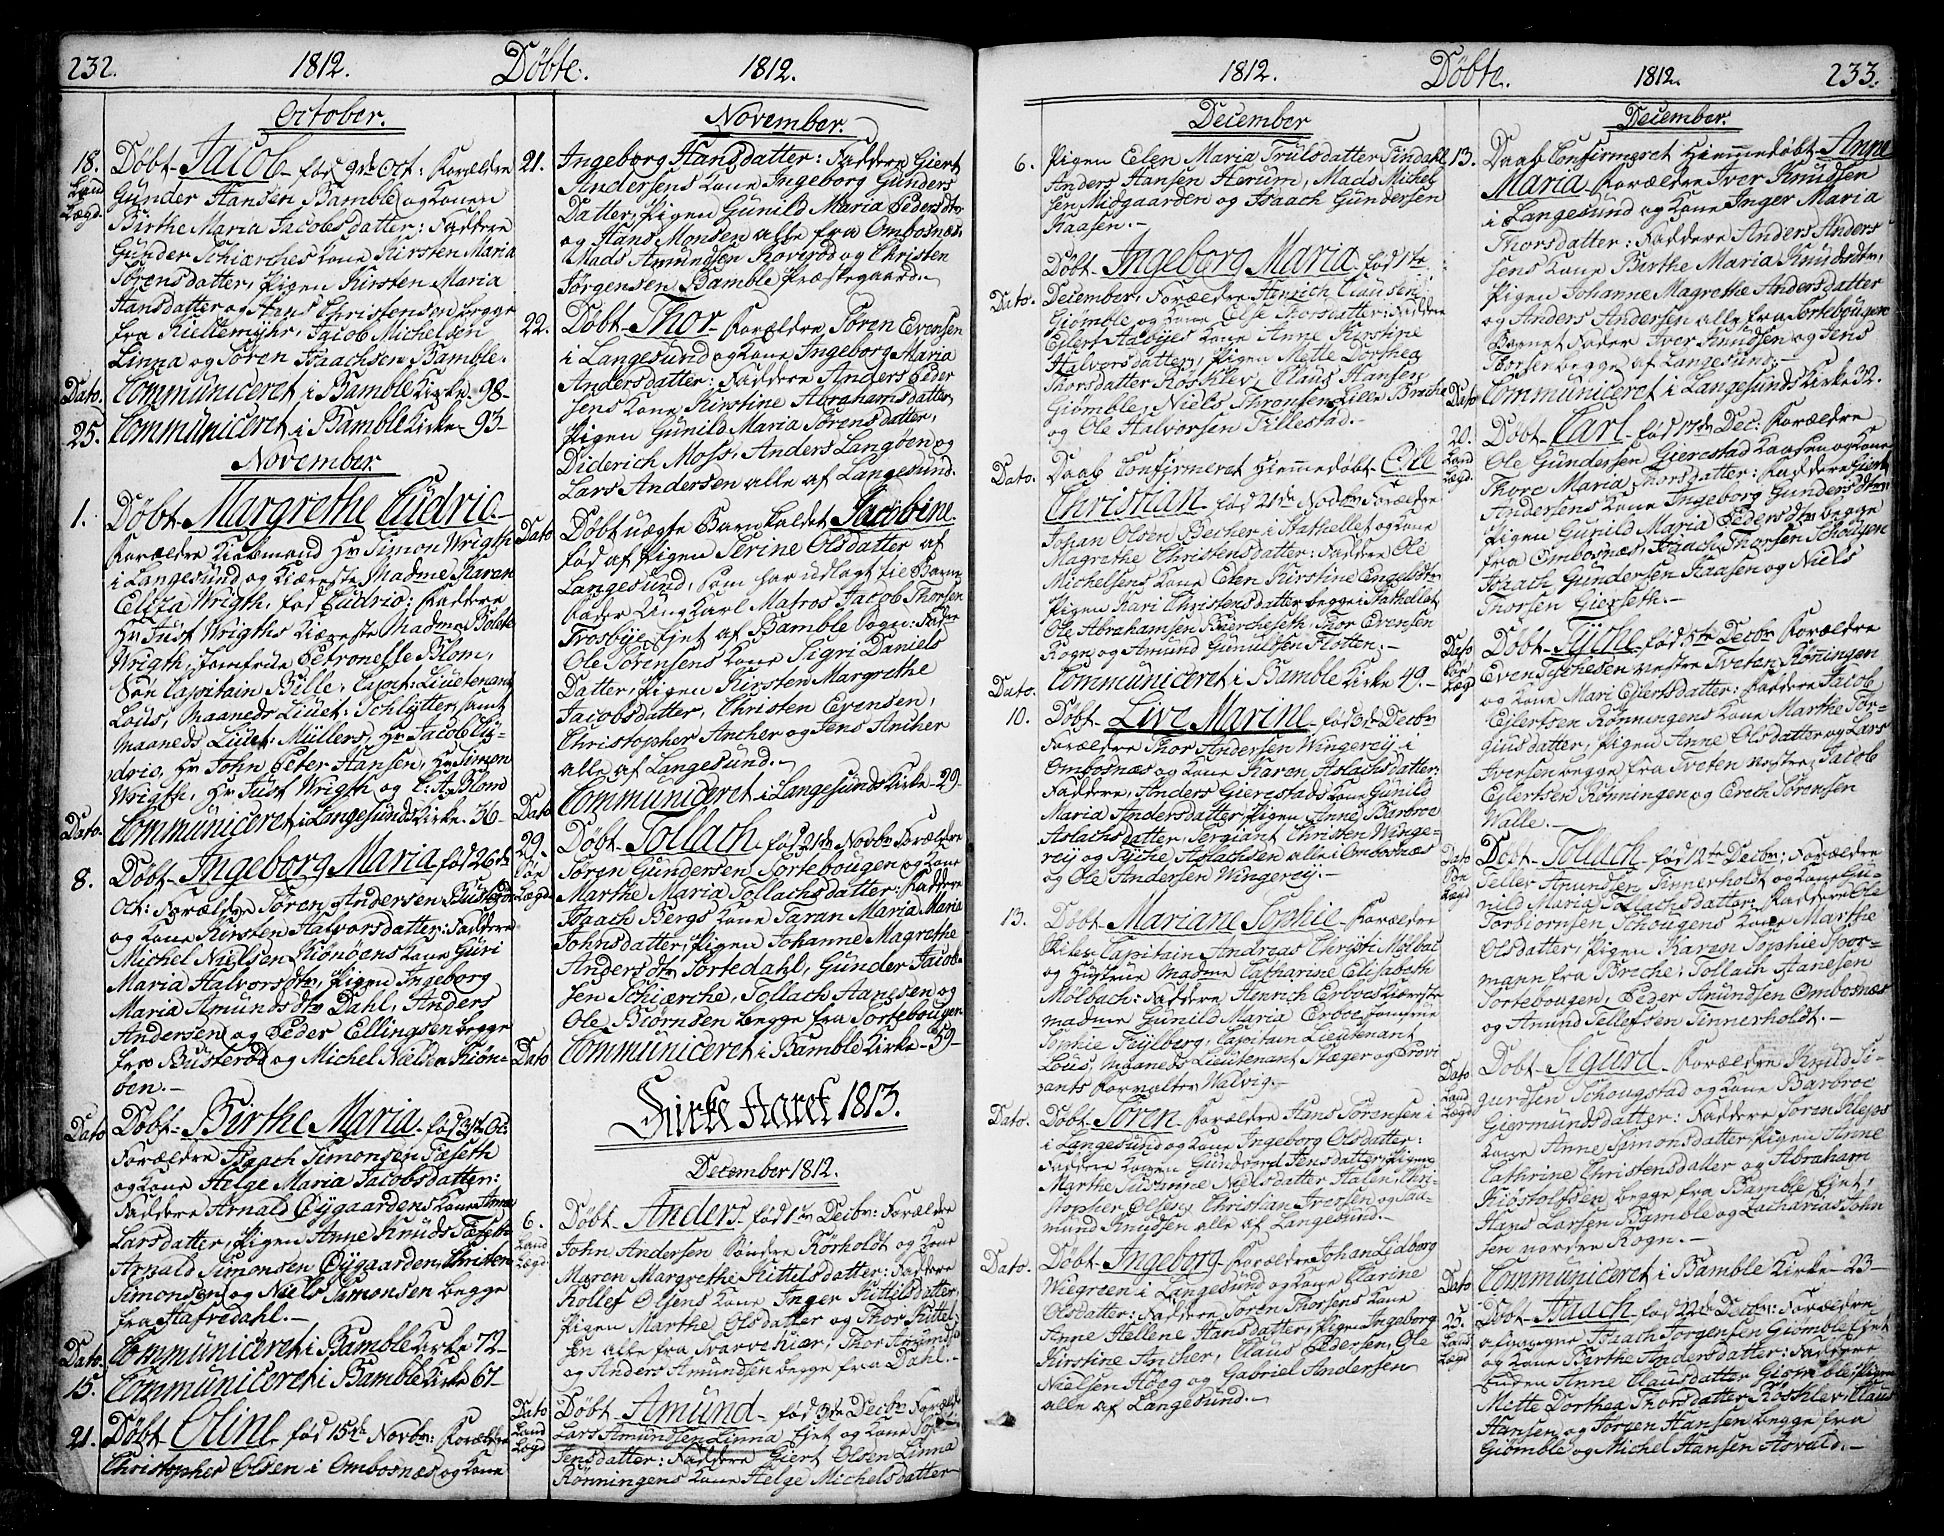 SAKO, Bamble kirkebøker, F/Fa/L0002: Ministerialbok nr. I 2, 1775-1814, s. 232-233